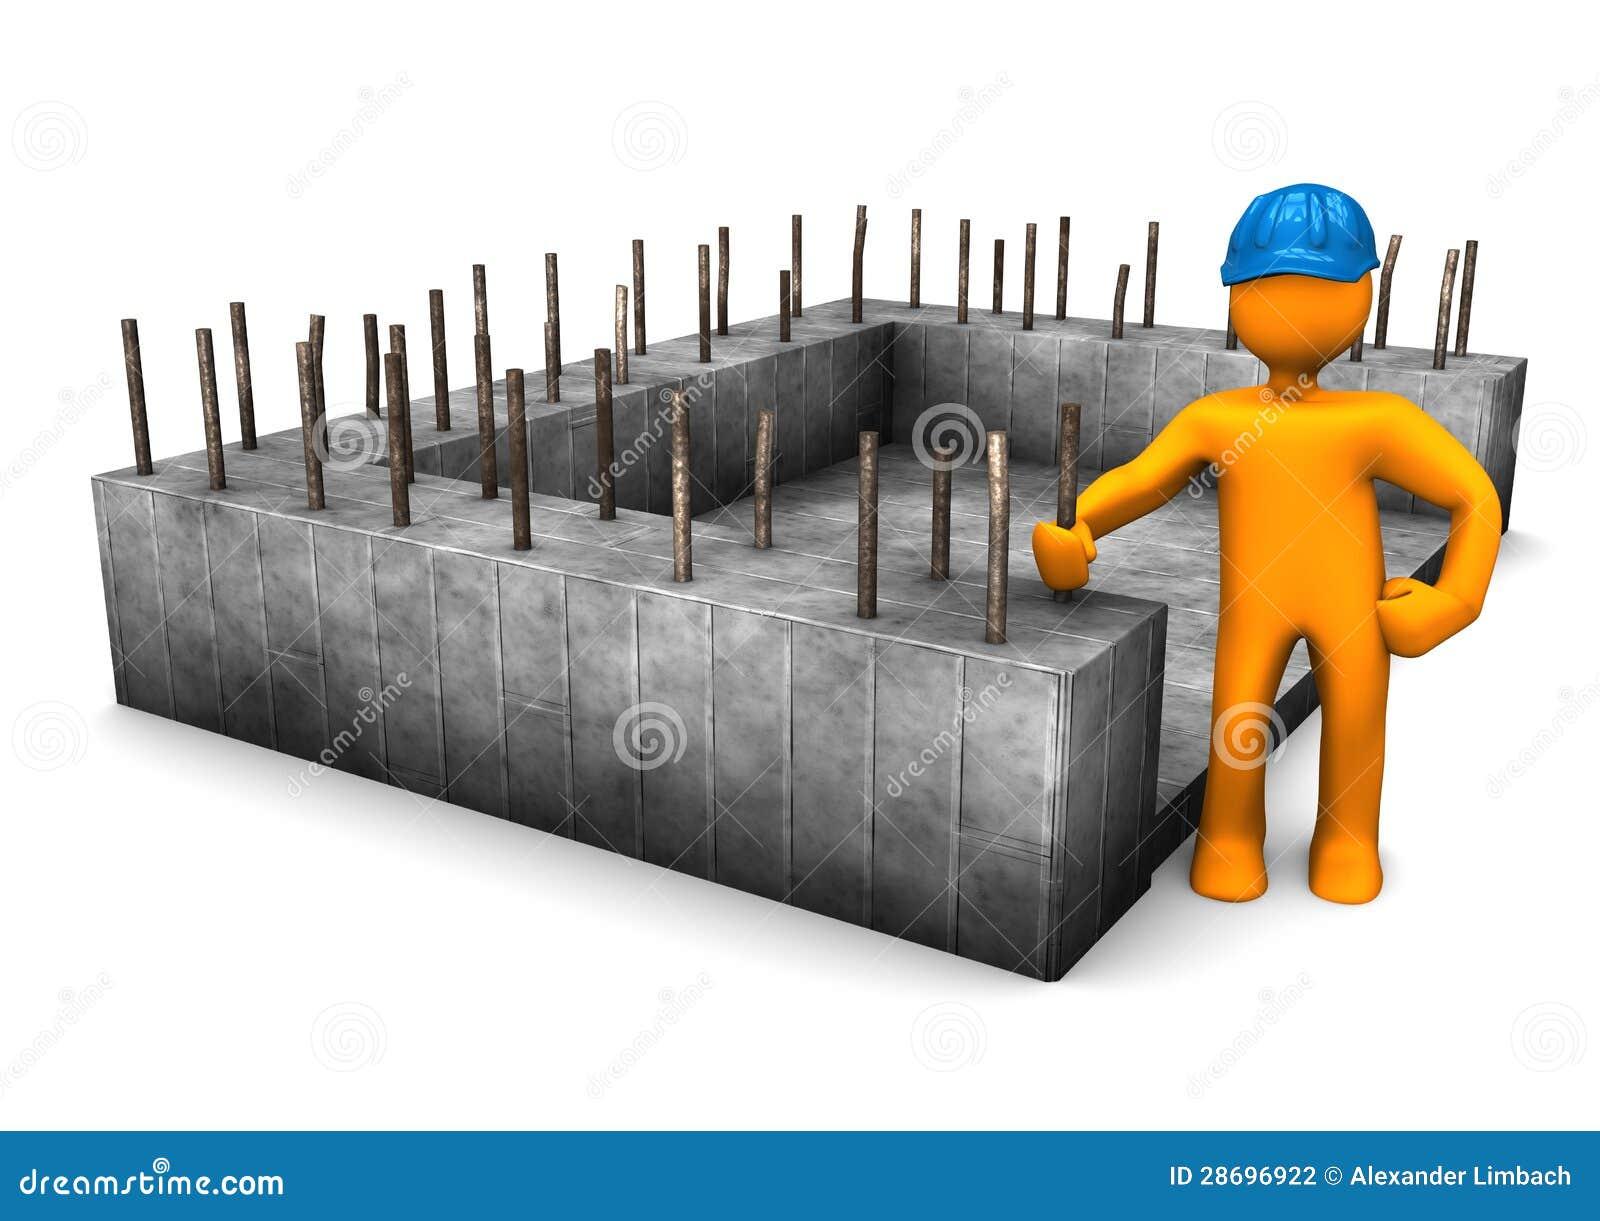 Foundation Civil Engineer Stock Photography - Image: 28696922 (1300 x 1009 Pixel)